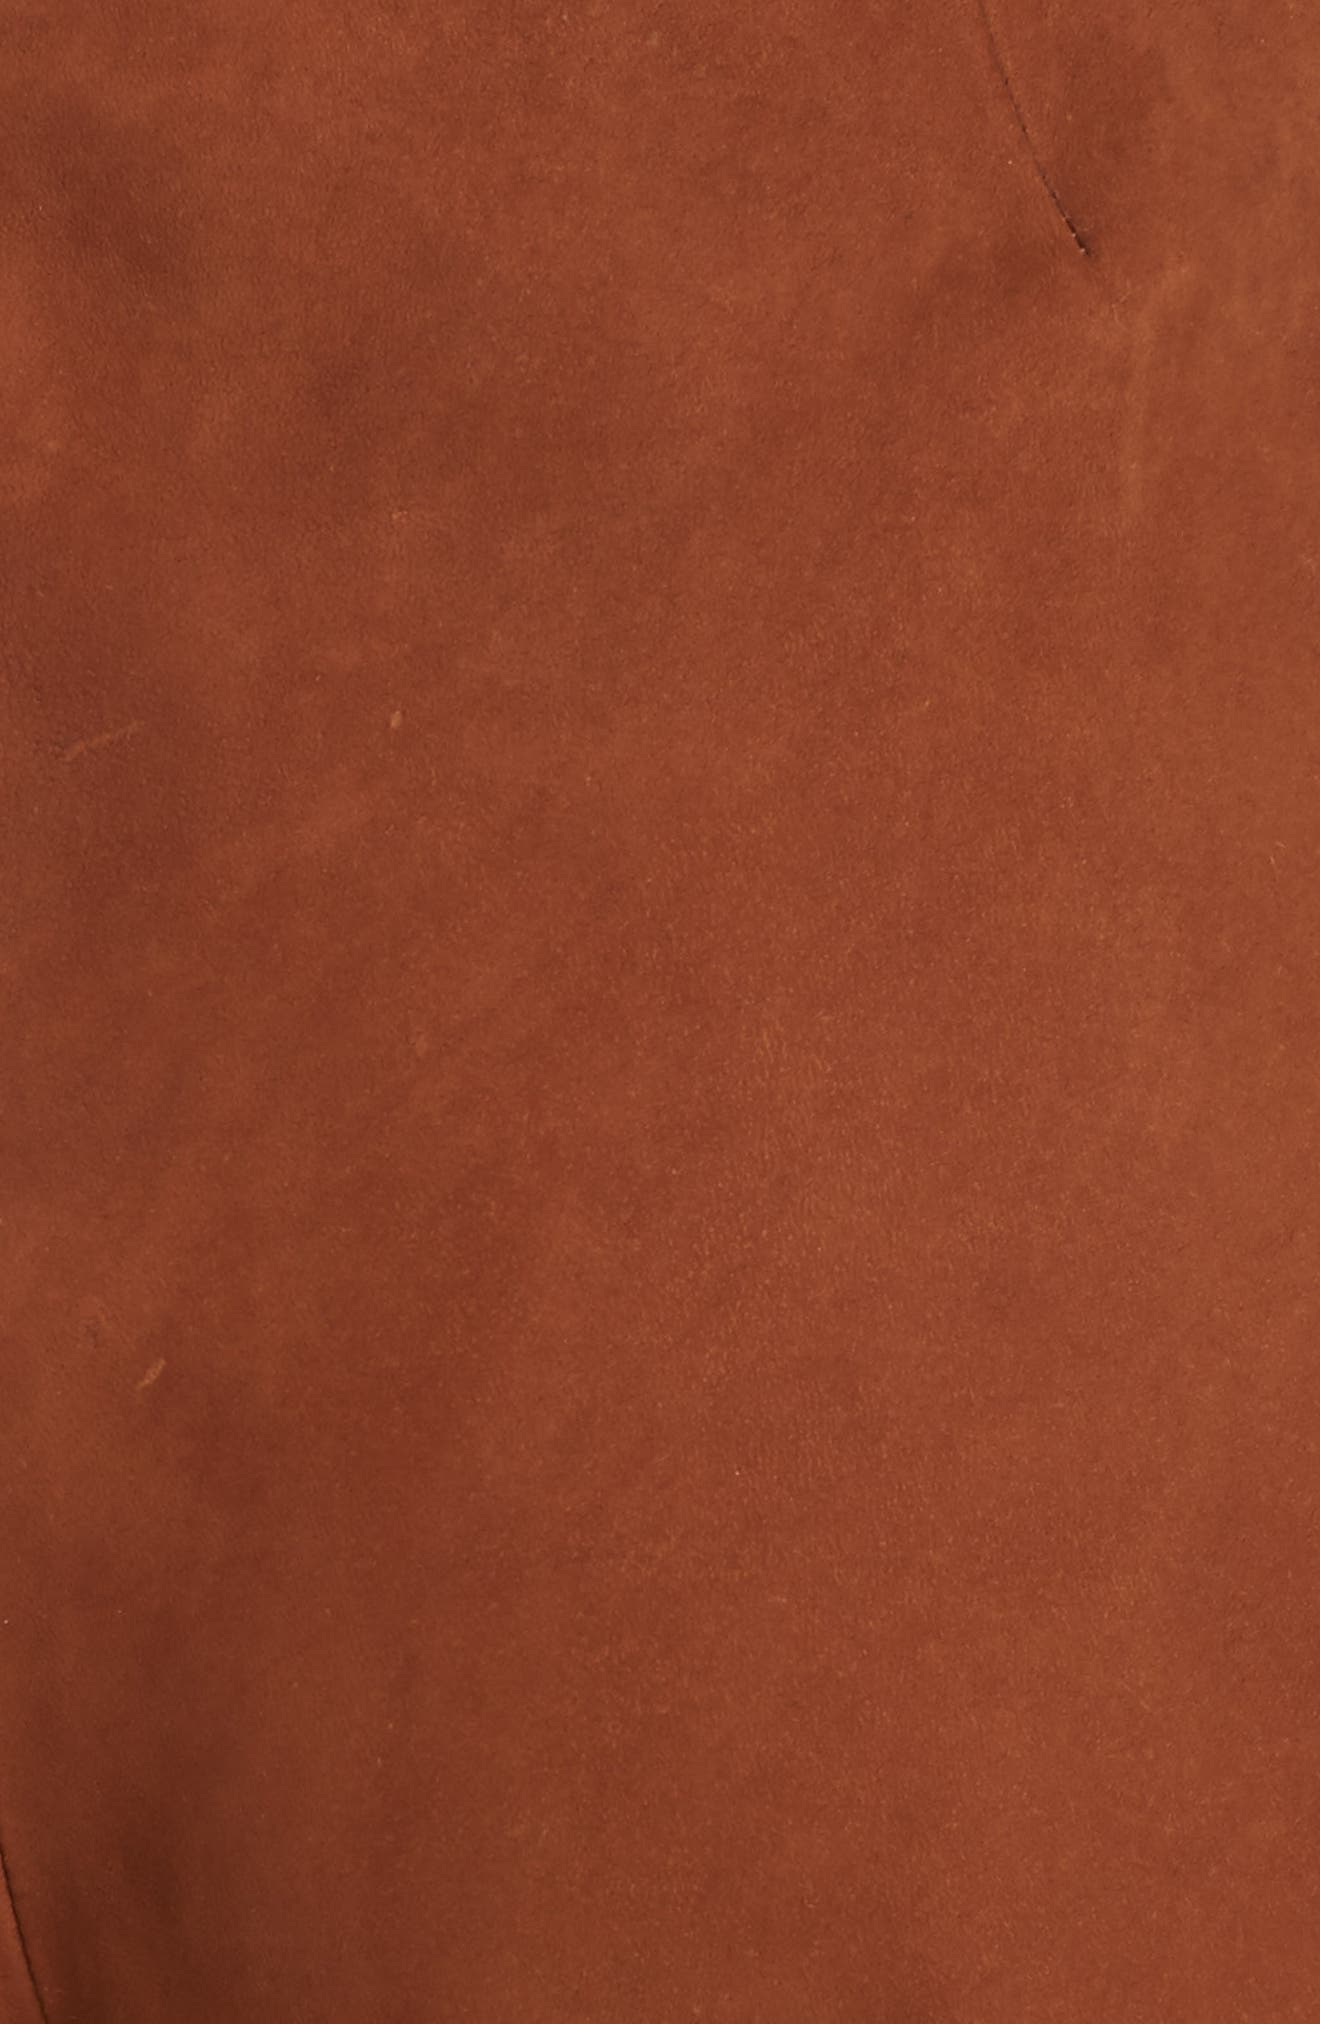 Suede Culottes,                             Alternate thumbnail 5, color,                             815